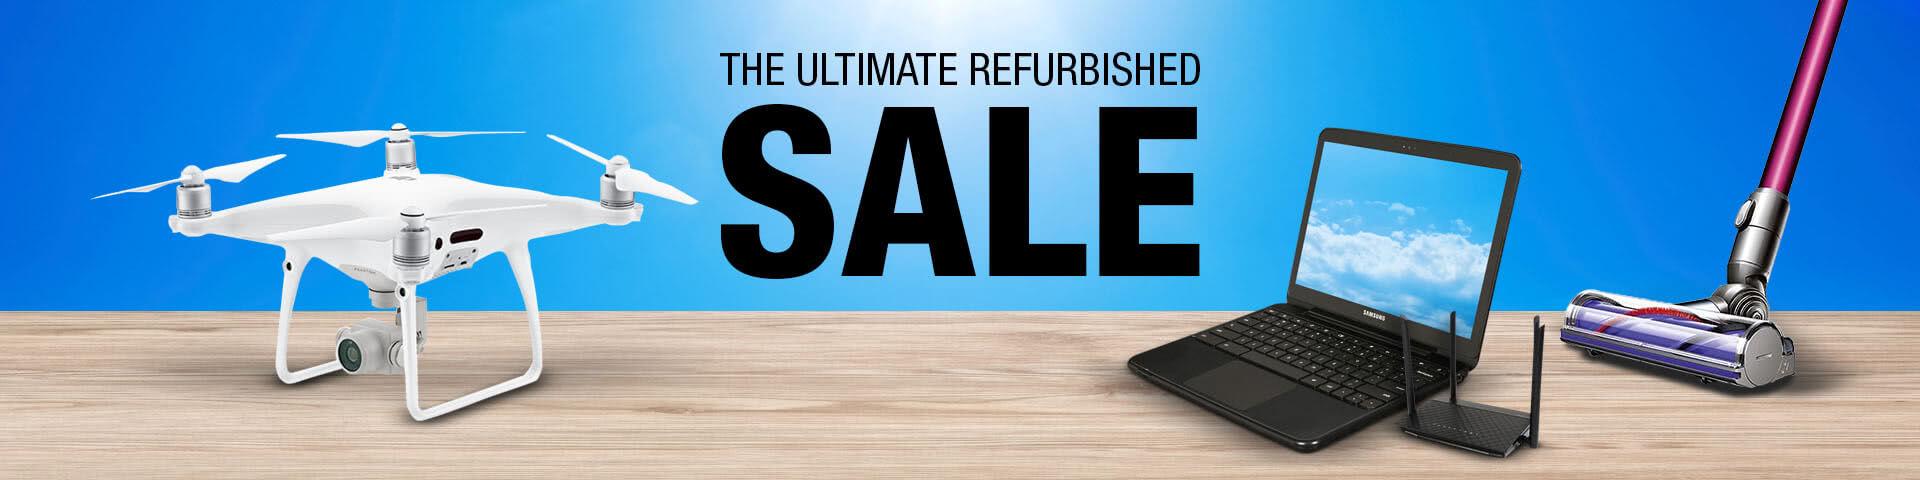 The Ultimate Refurbished Sale: $69 99 Samsung Chromebook